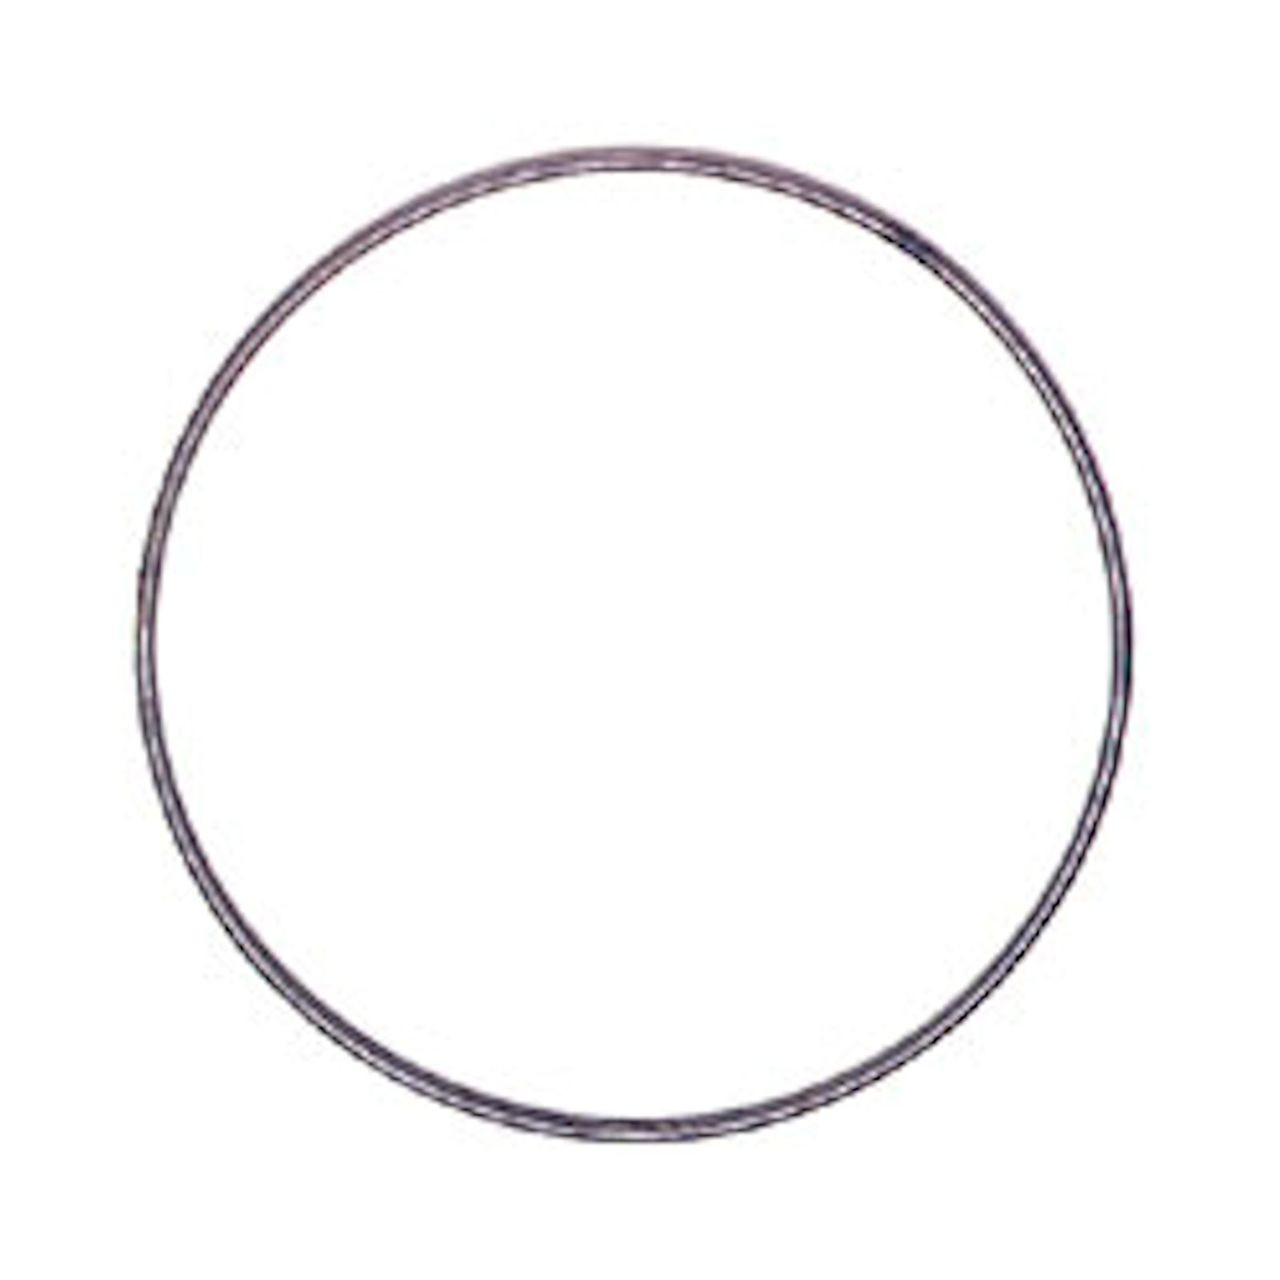 Metal Hoop Ring For Crafts 5 Quot 3602 05 Stecksstore